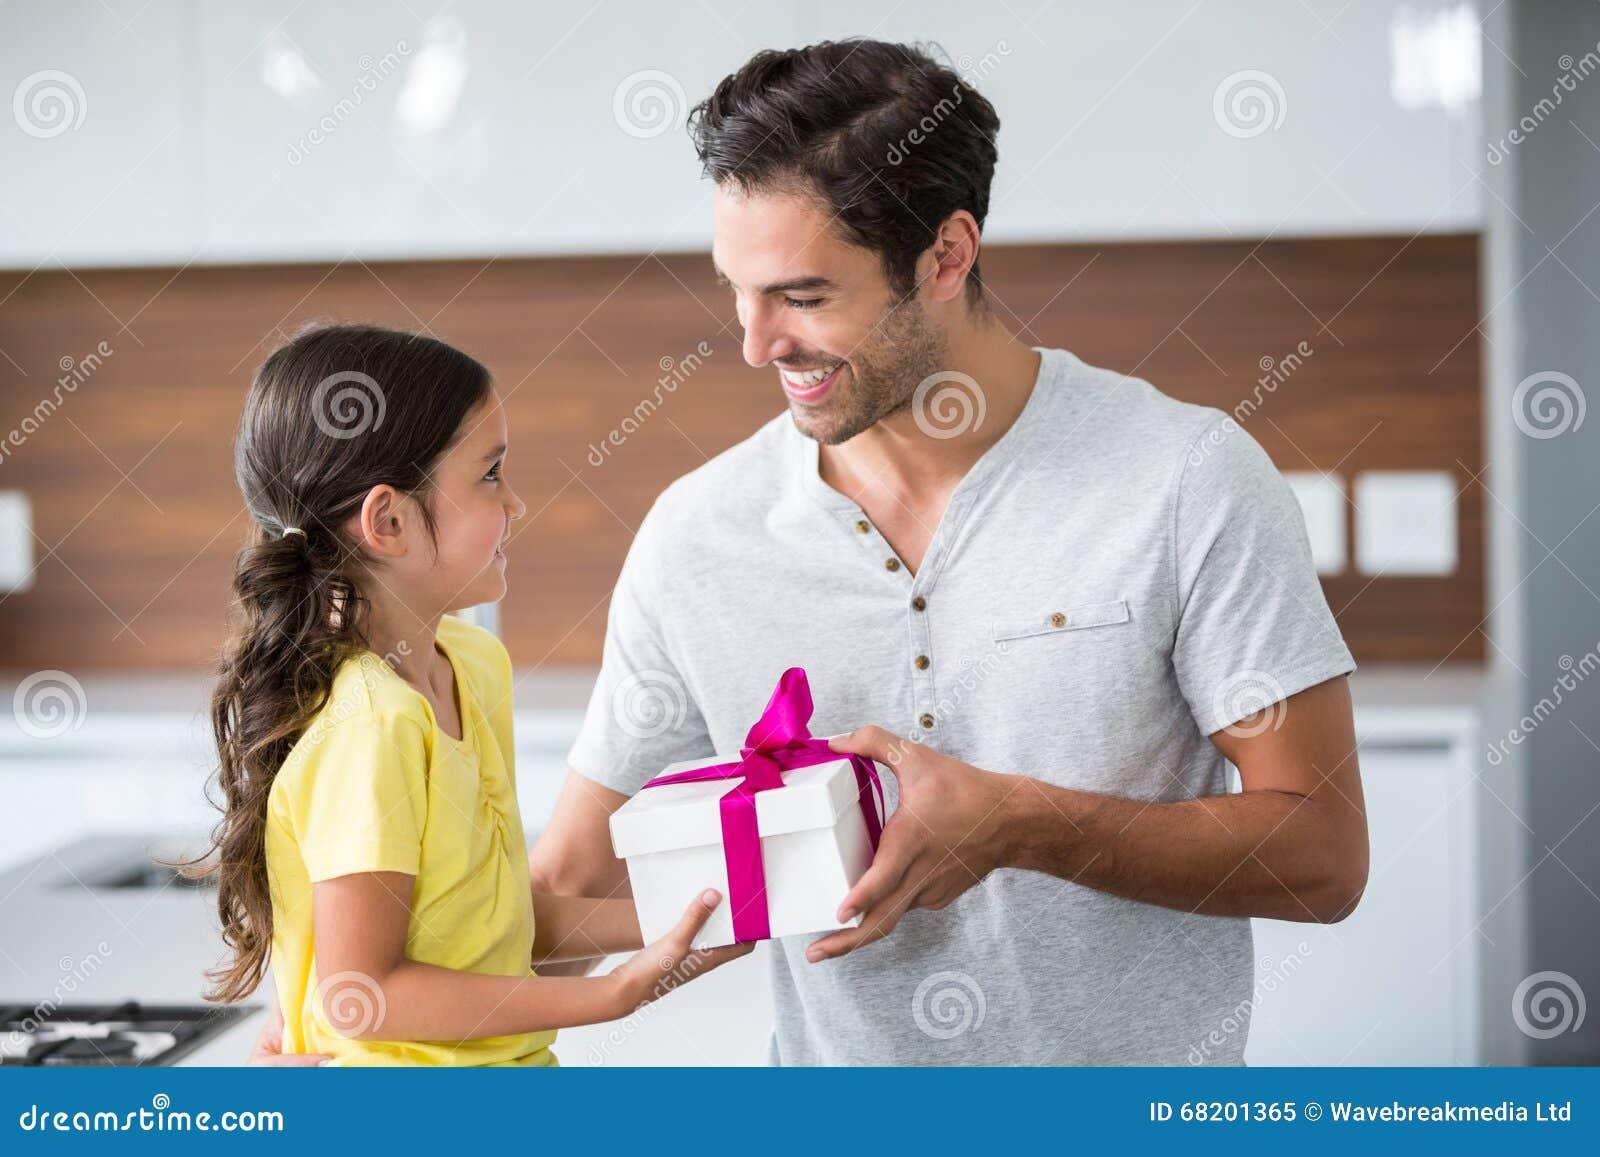 Daughters giving dads handjob